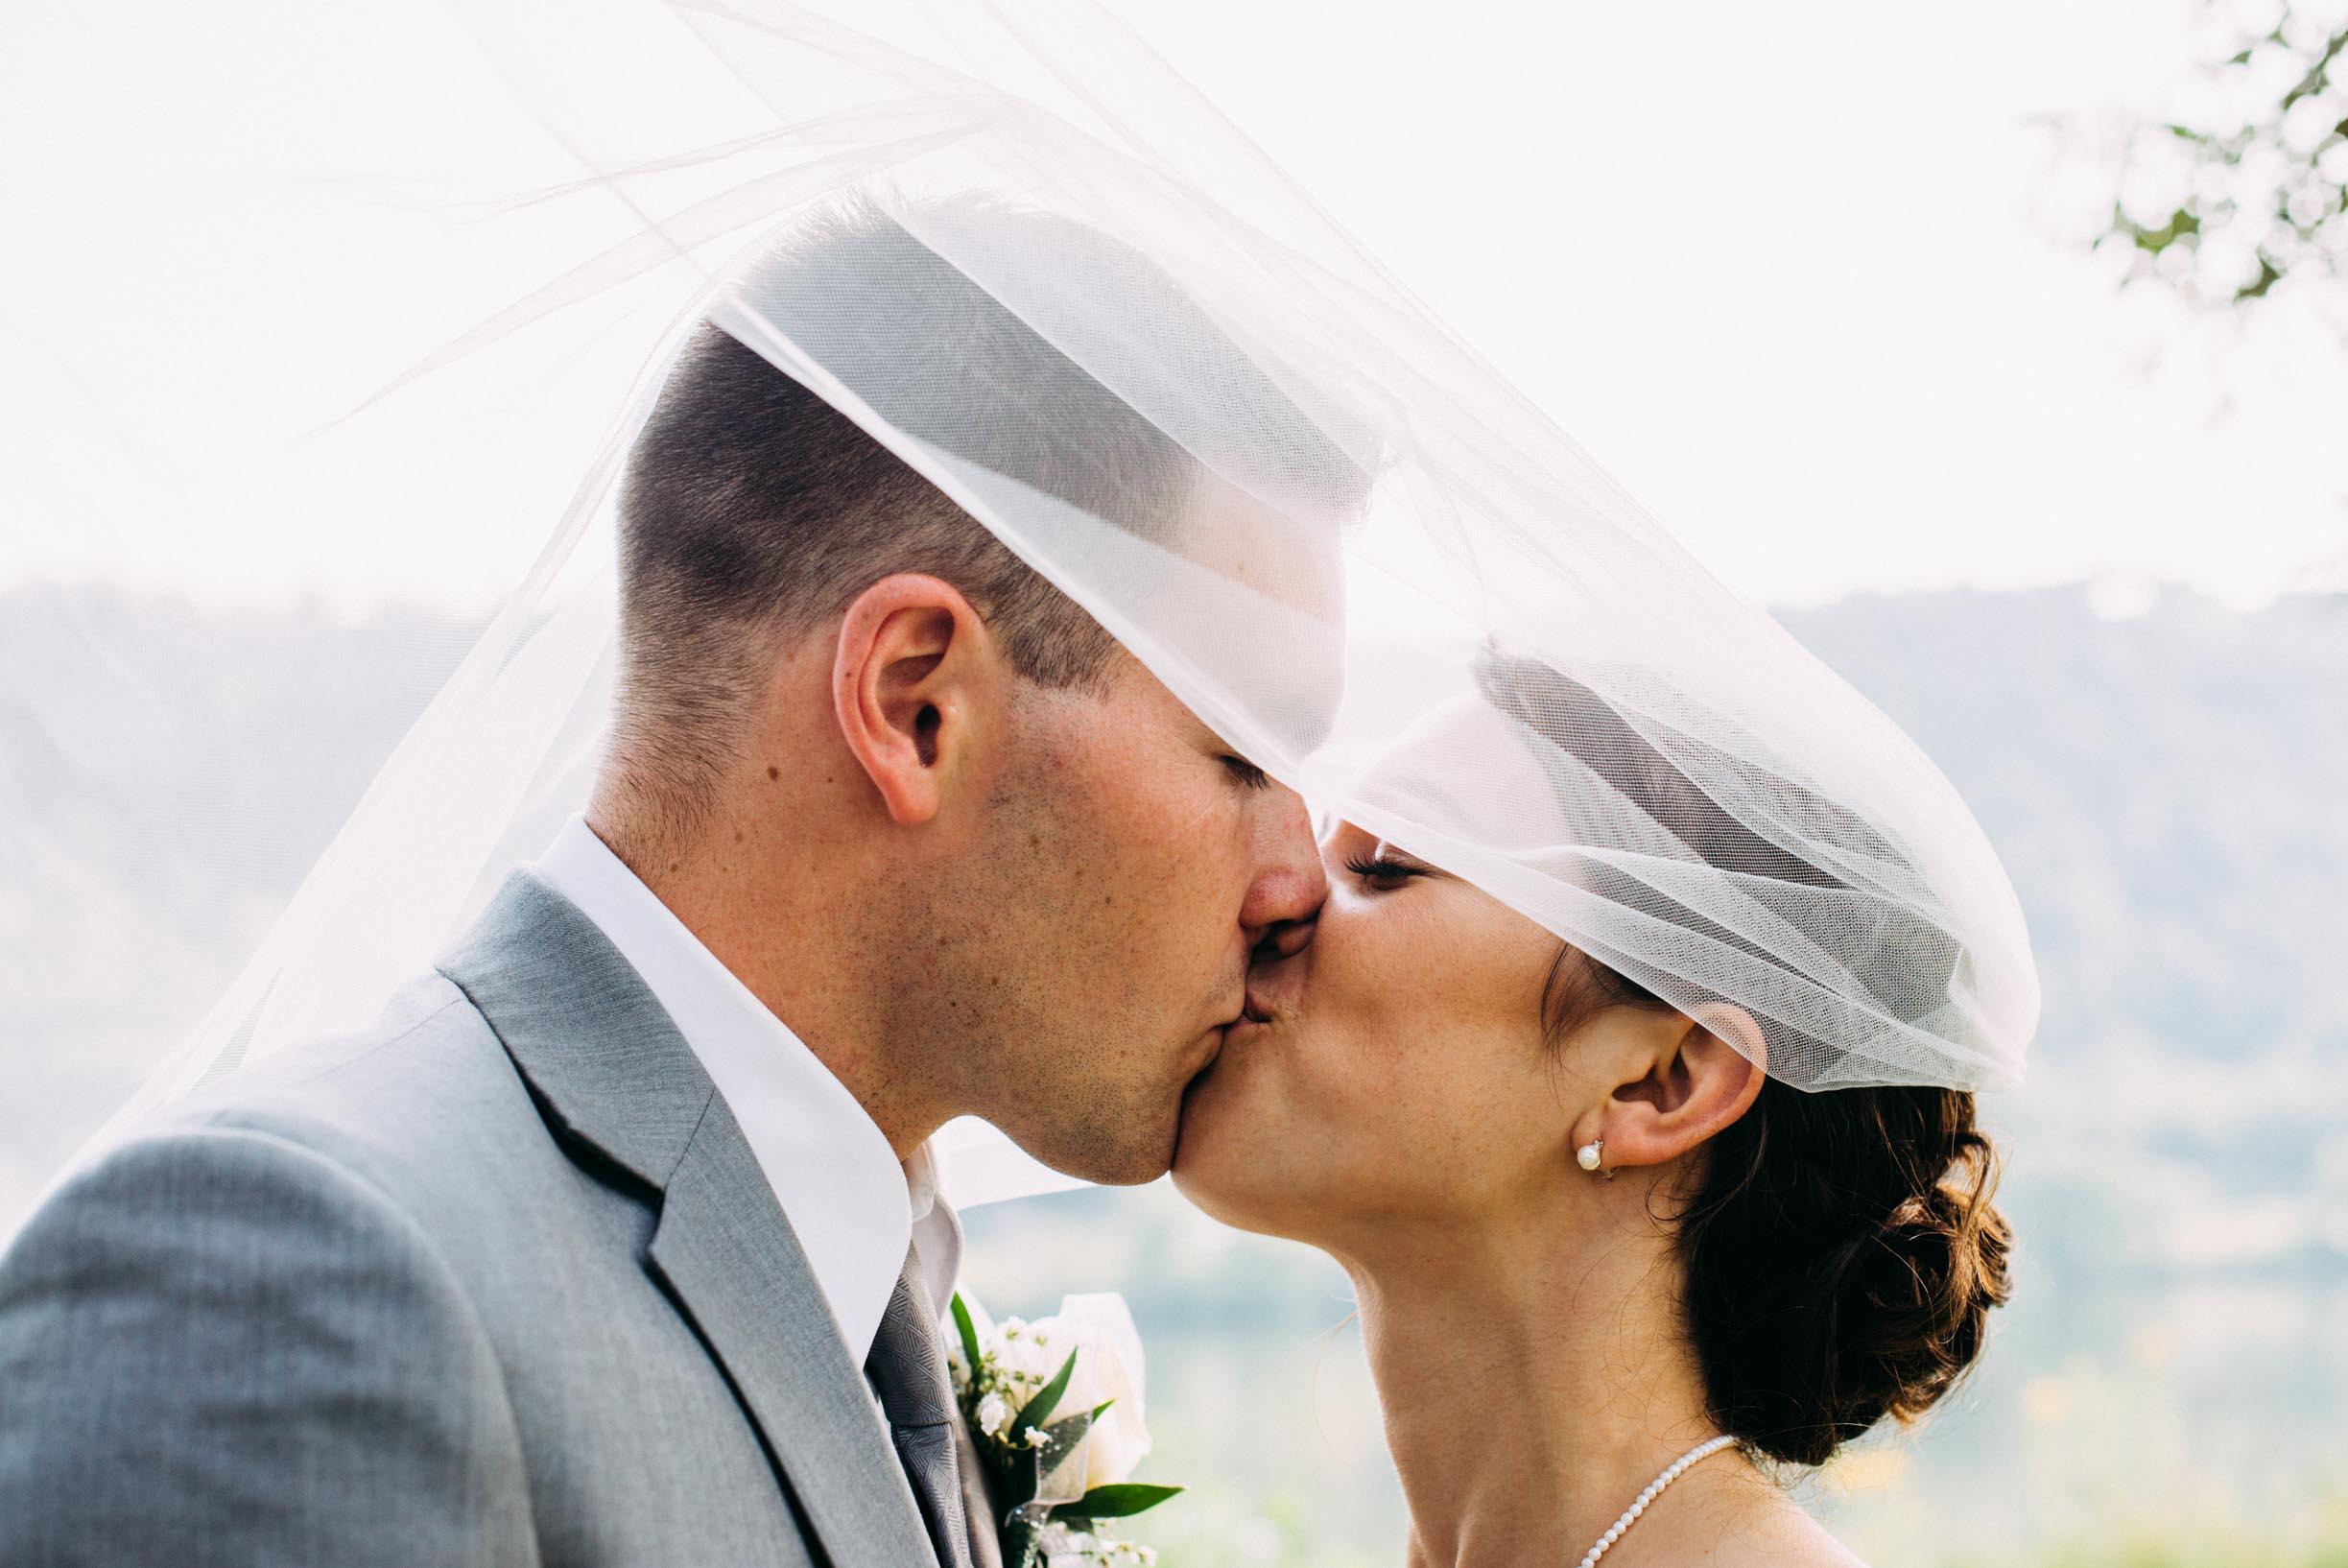 28-Lindsey Jake Wedding Portraits Winona Bride Groom.jpg